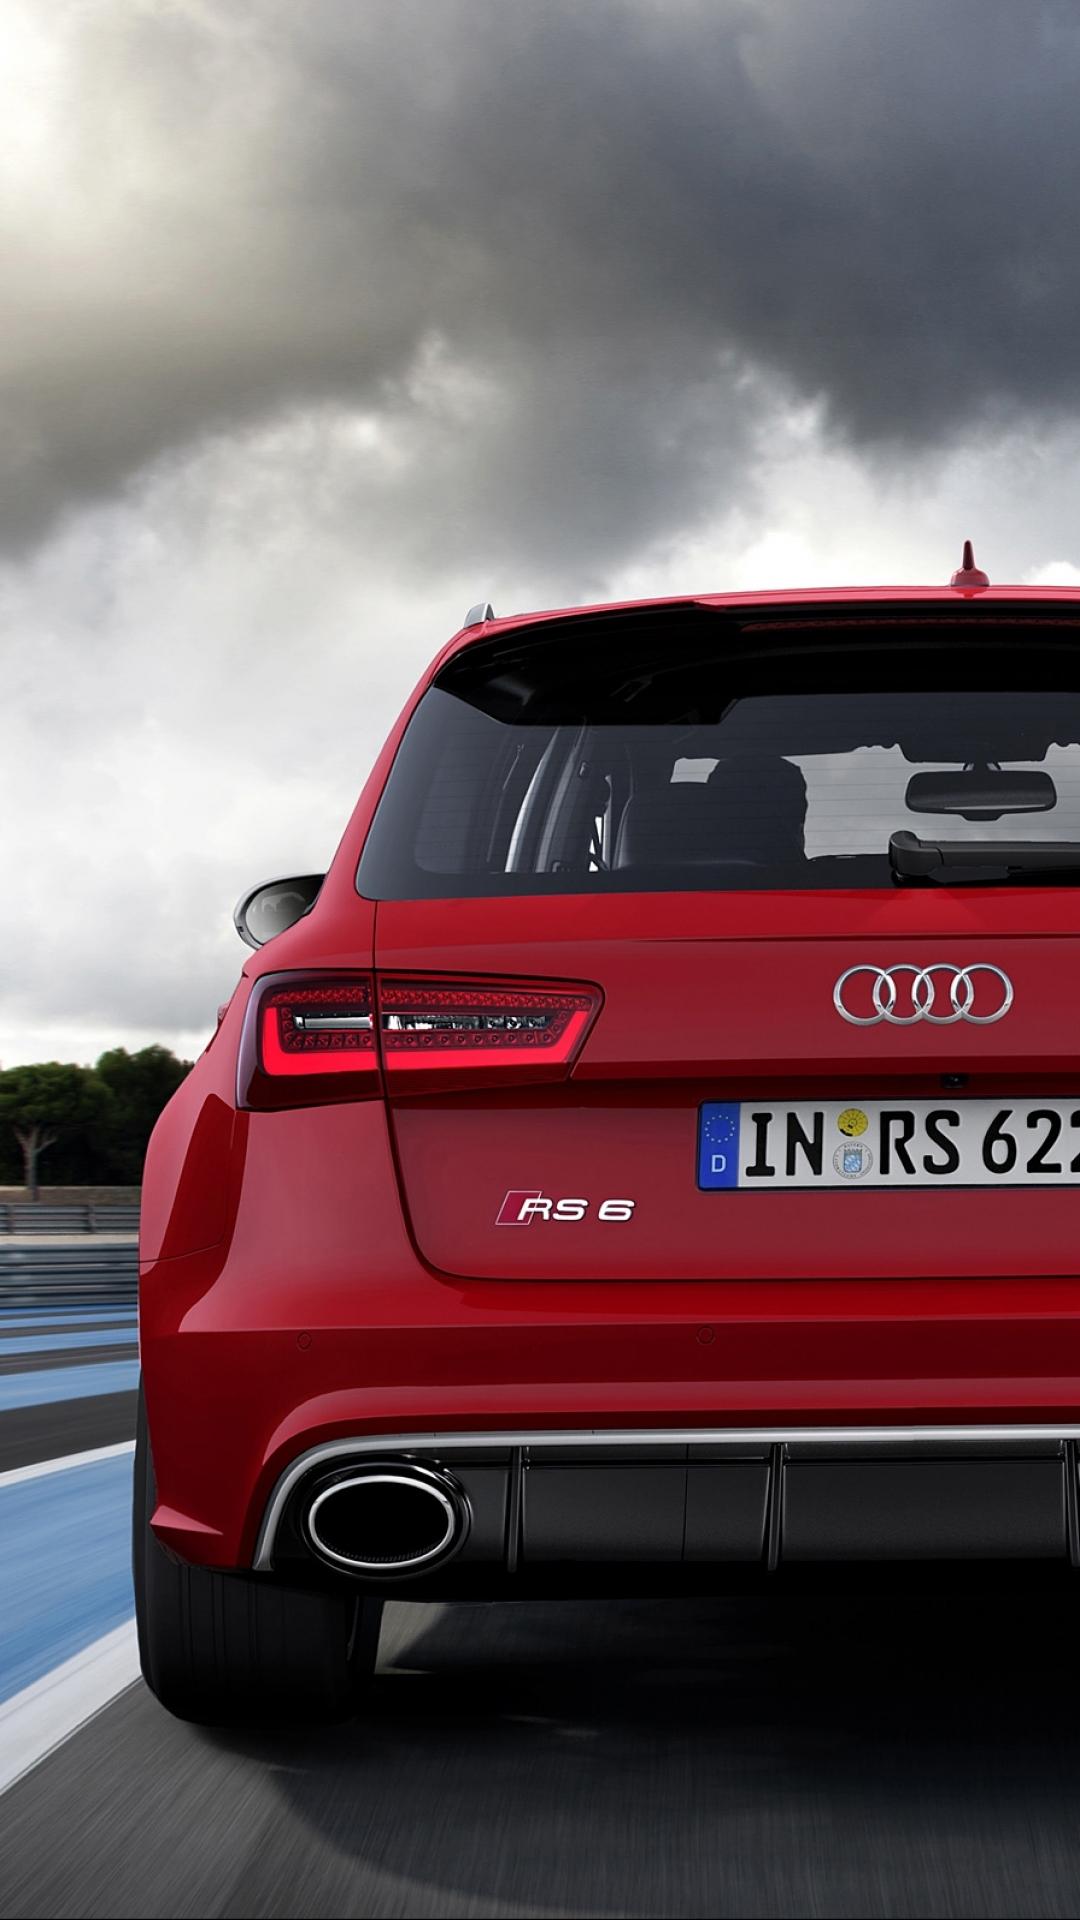 Audi Rs 6 2013 1080x1920 Wallpaper Teahub Io